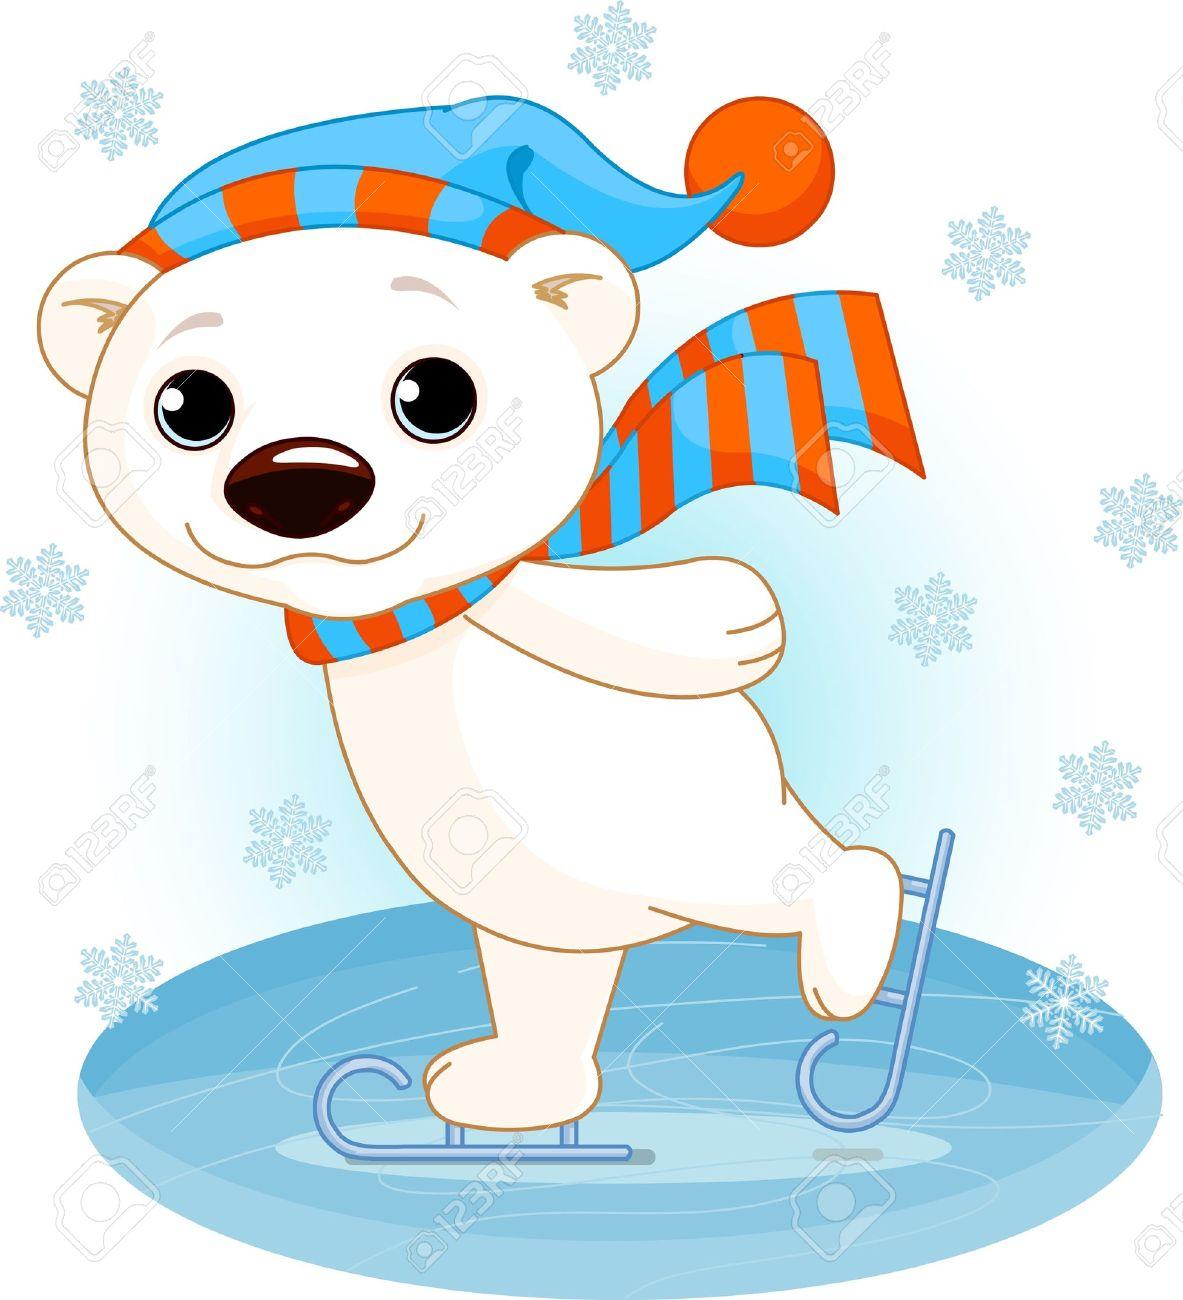 Illustration of cute polar bear on ice skates.